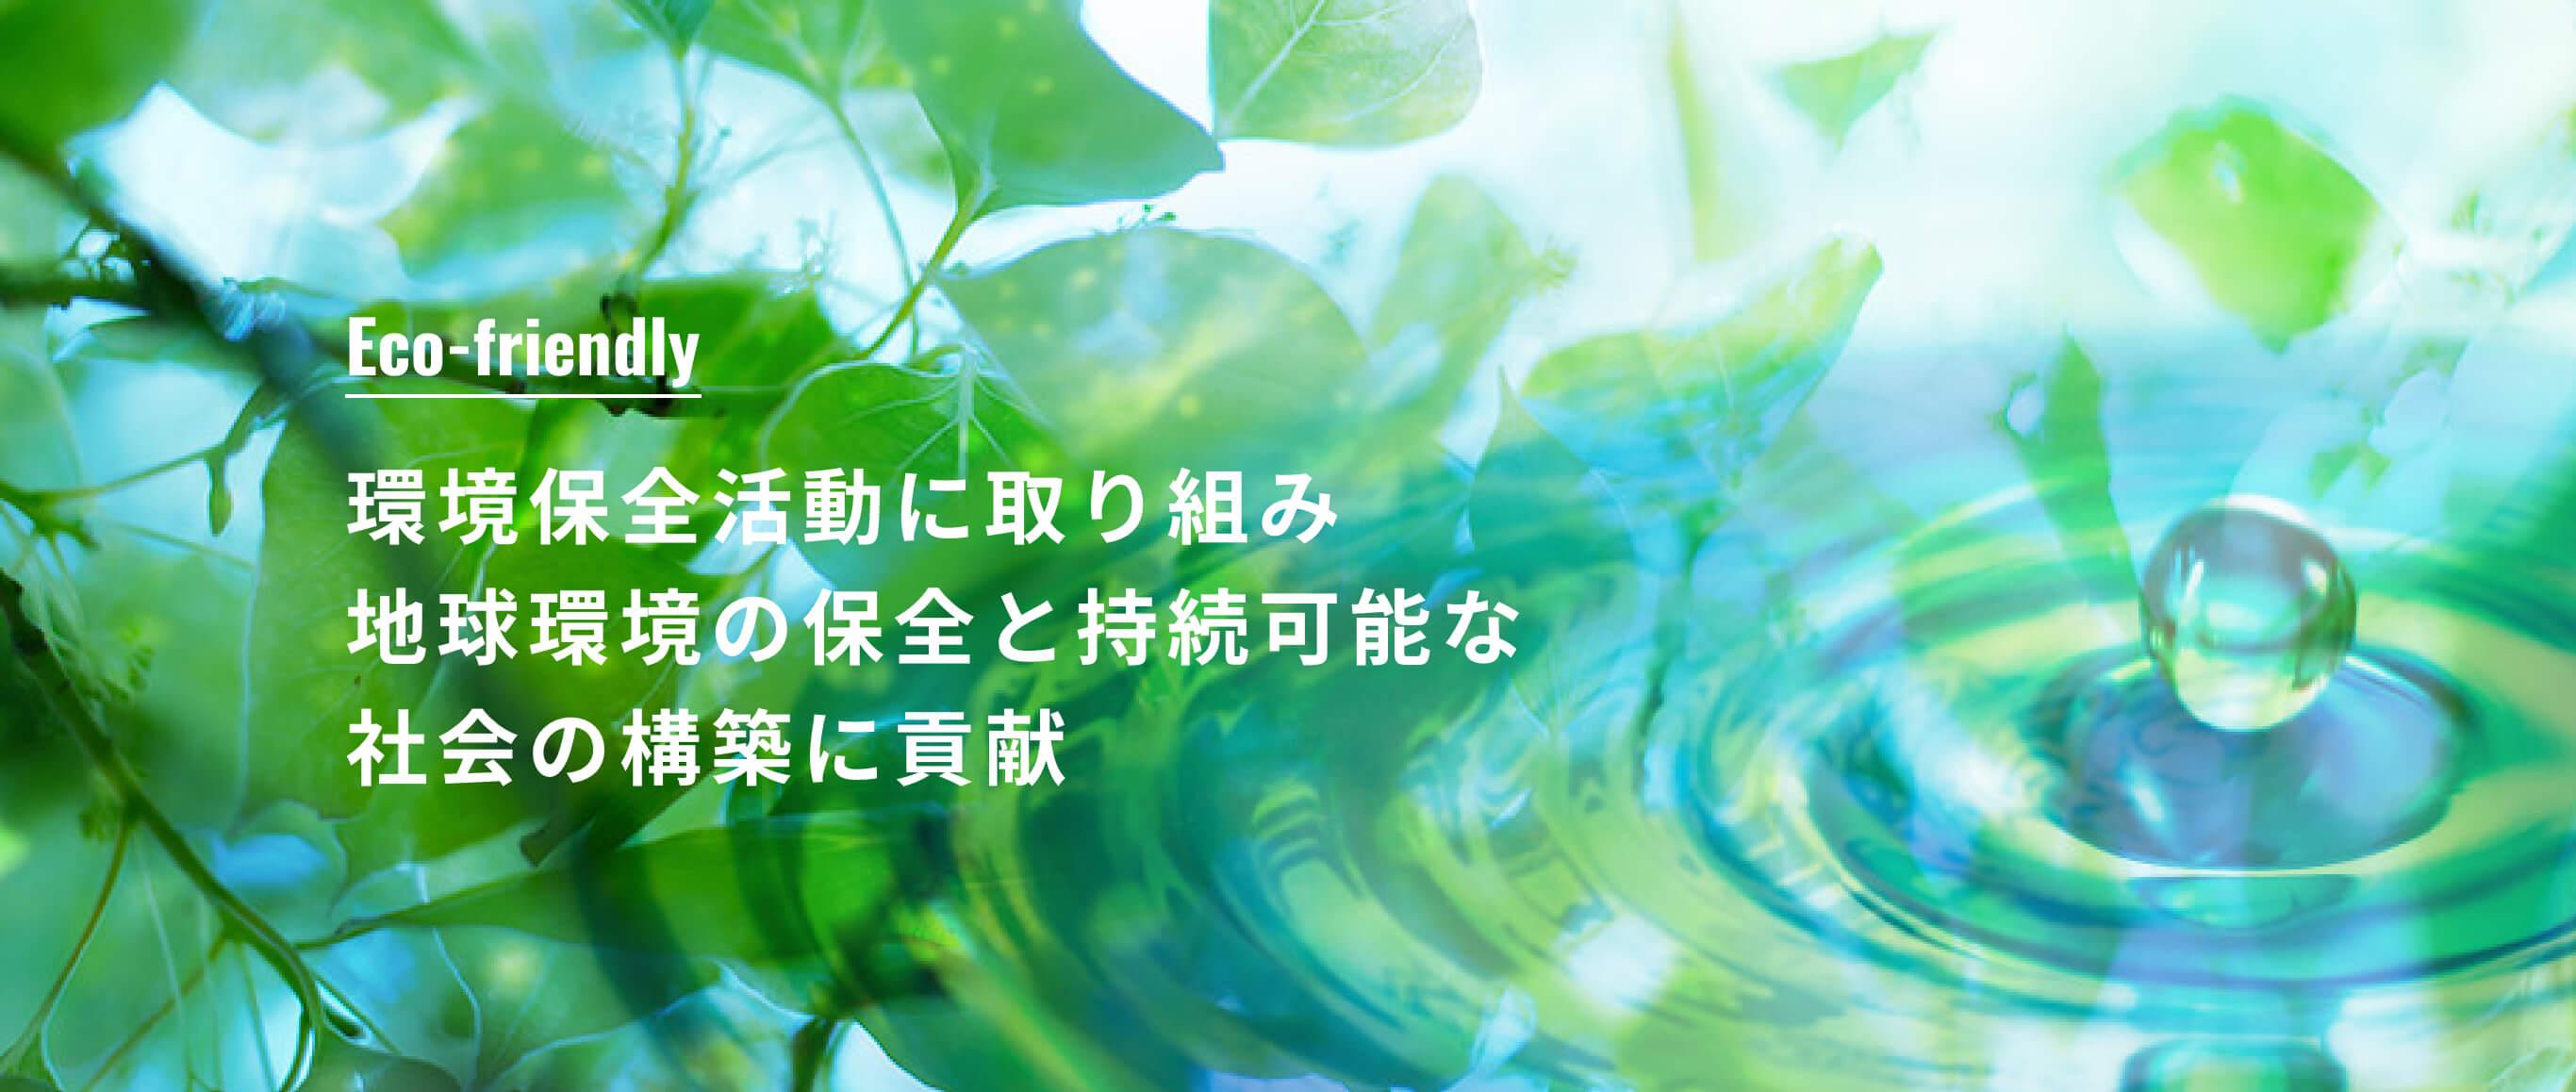 Eco-friendly 環境保全活動に取り組み地球環境の保全と持続可能な社会の構築に貢献